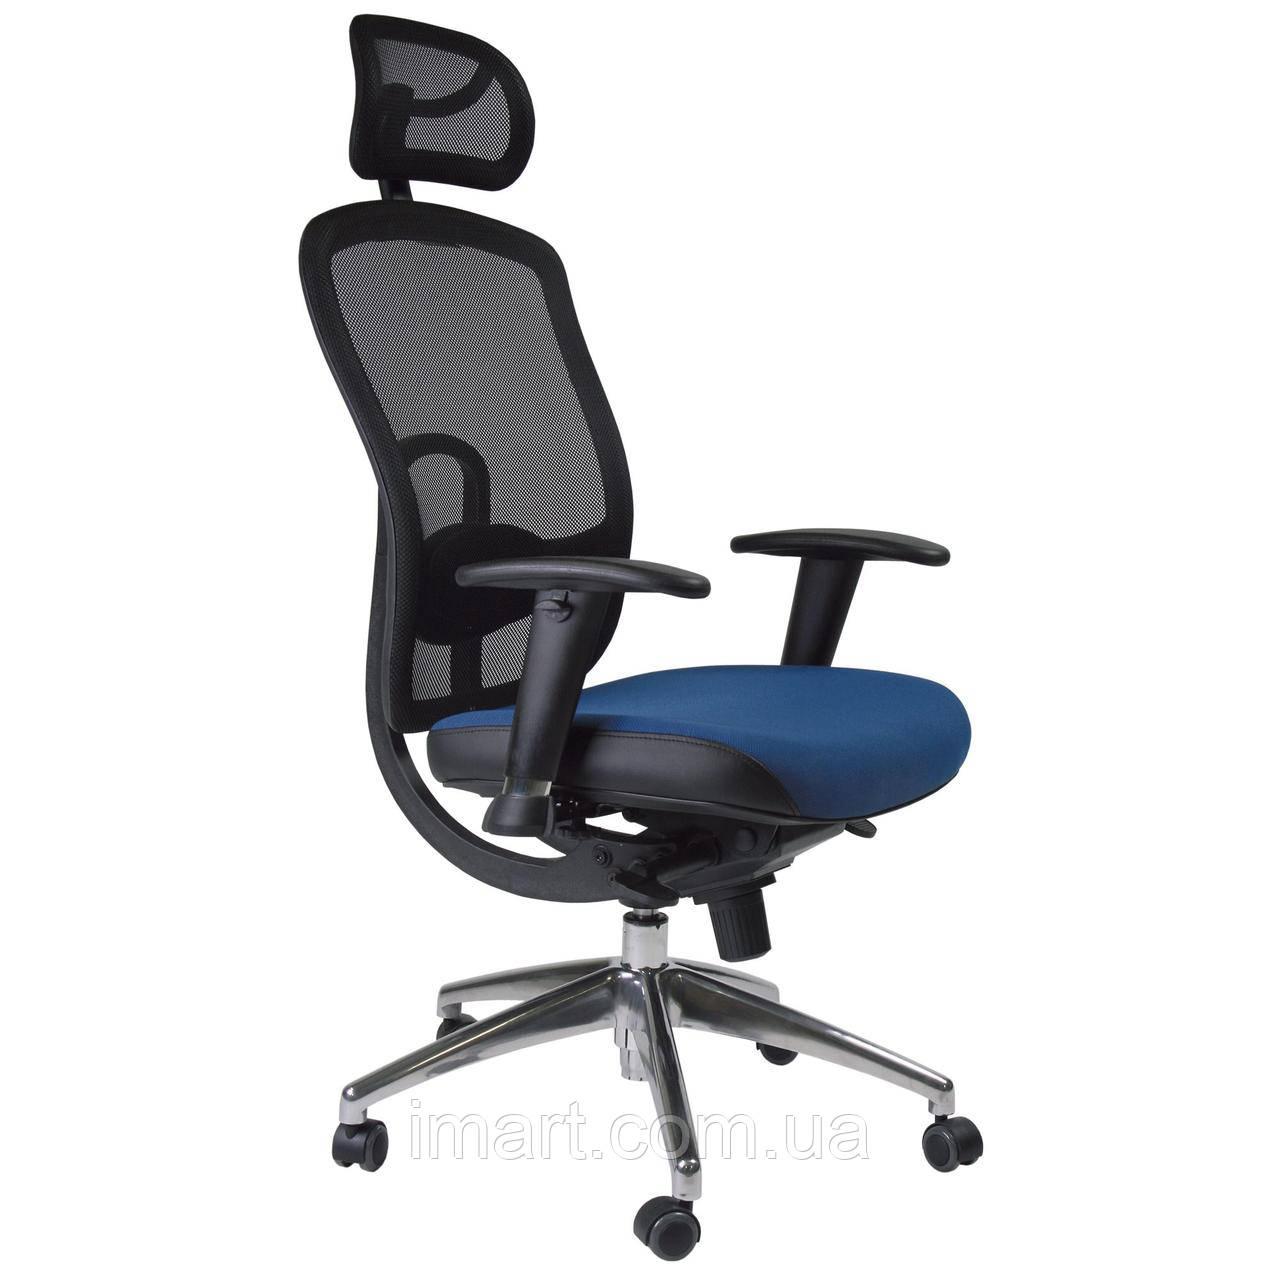 Офисное кресло Offce4You RAGUSA, LUCCA, blue